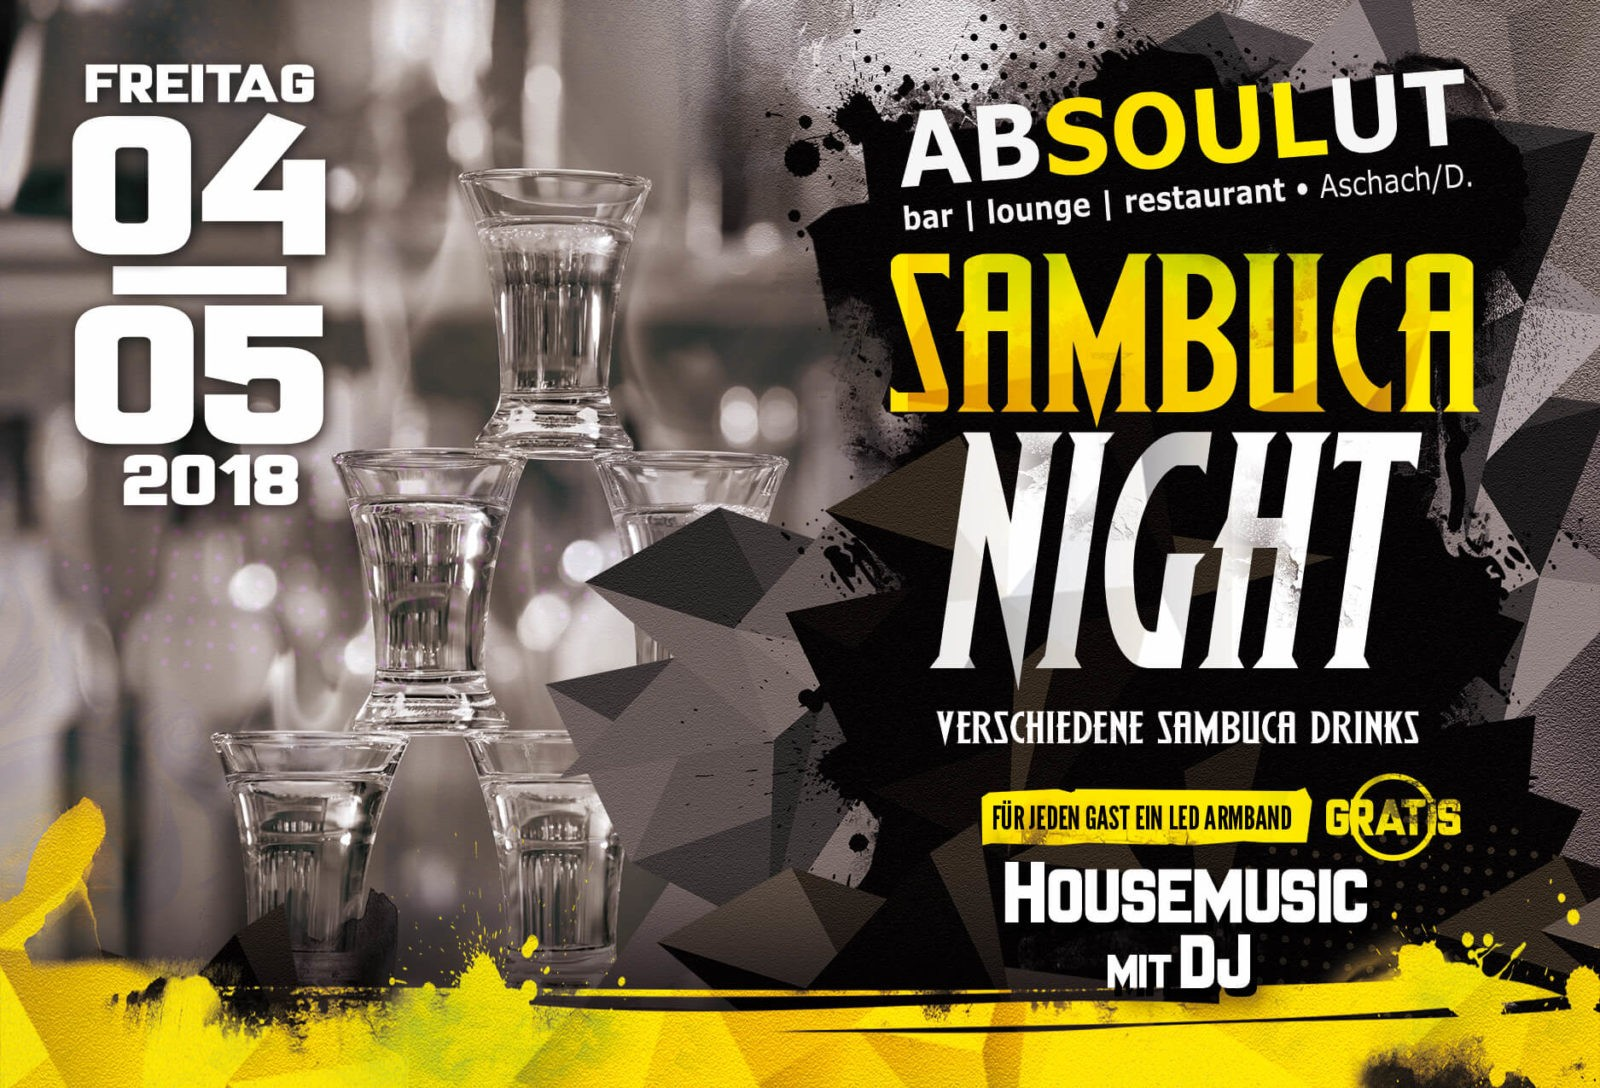 Absolut Bar Restaurant Events - Sambuca Nacht